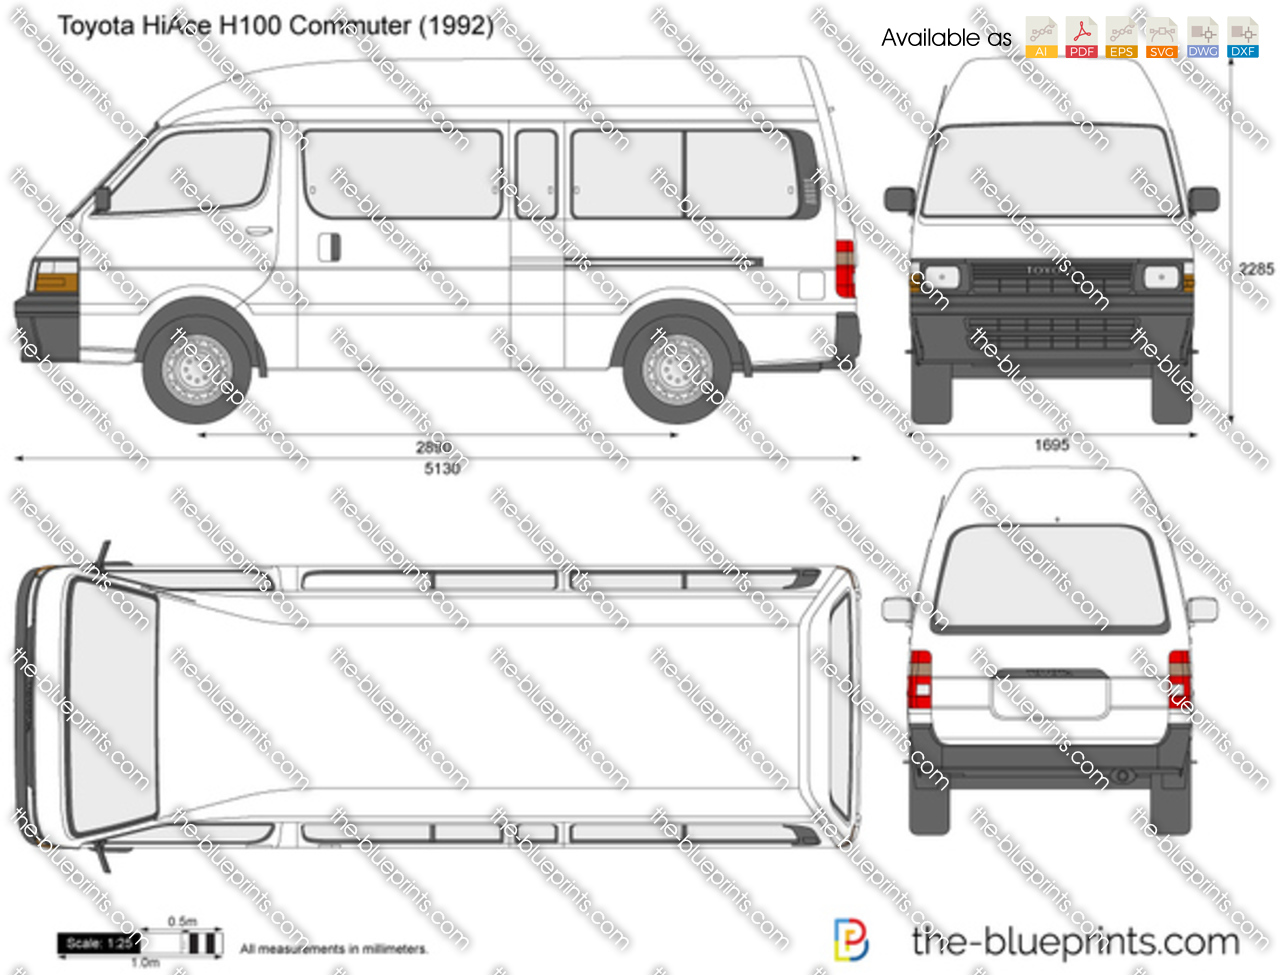 Toyota HiAce H100 Commuter 2013